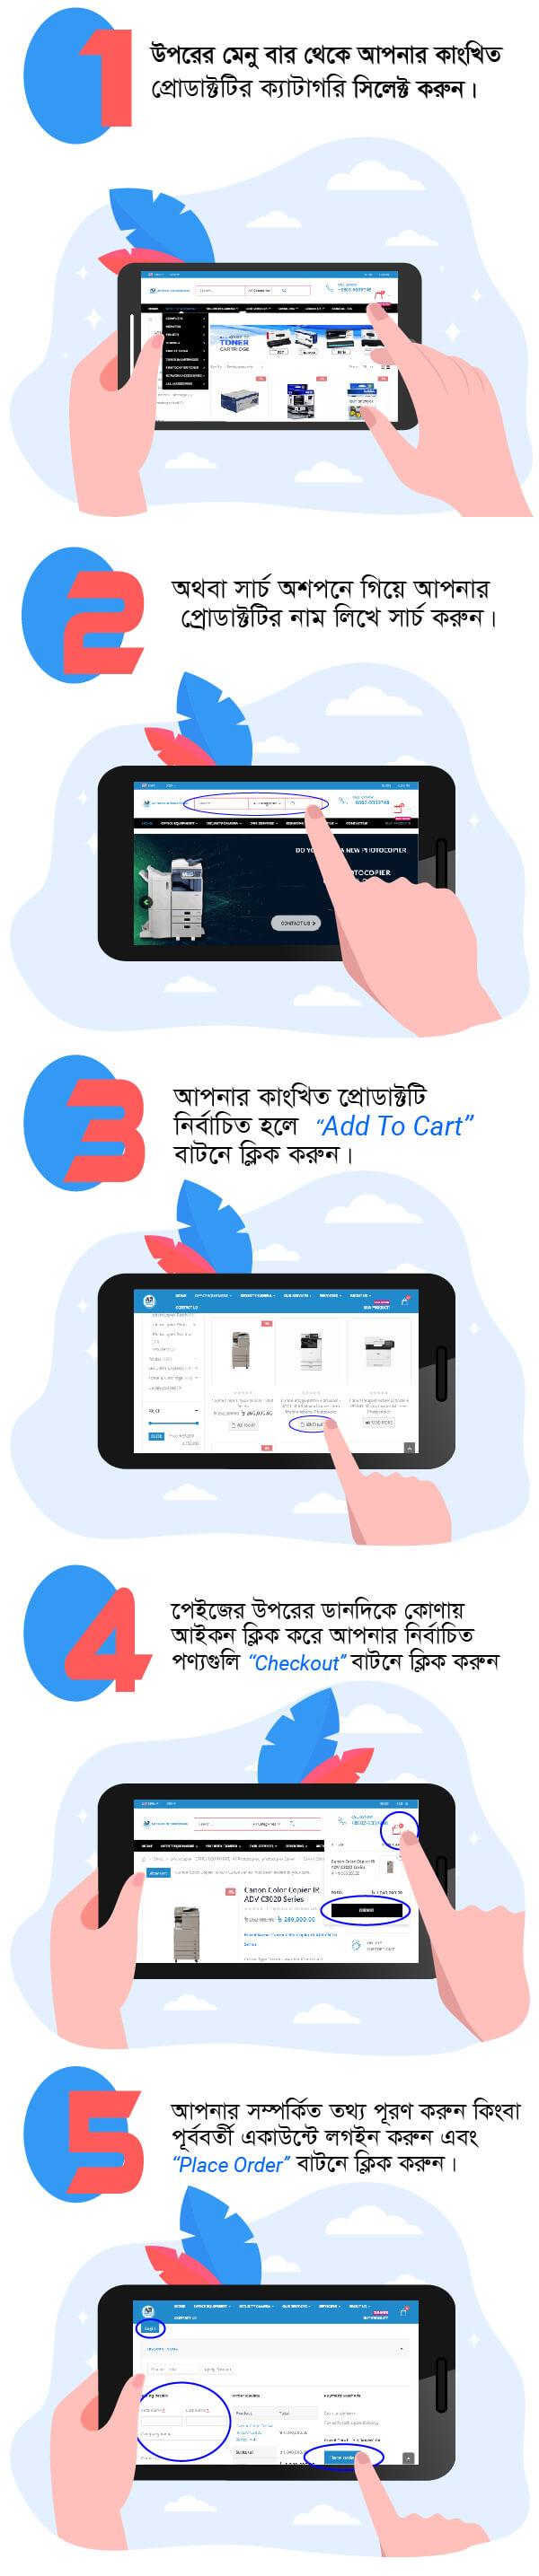 How To Buy Jakariya Shakil